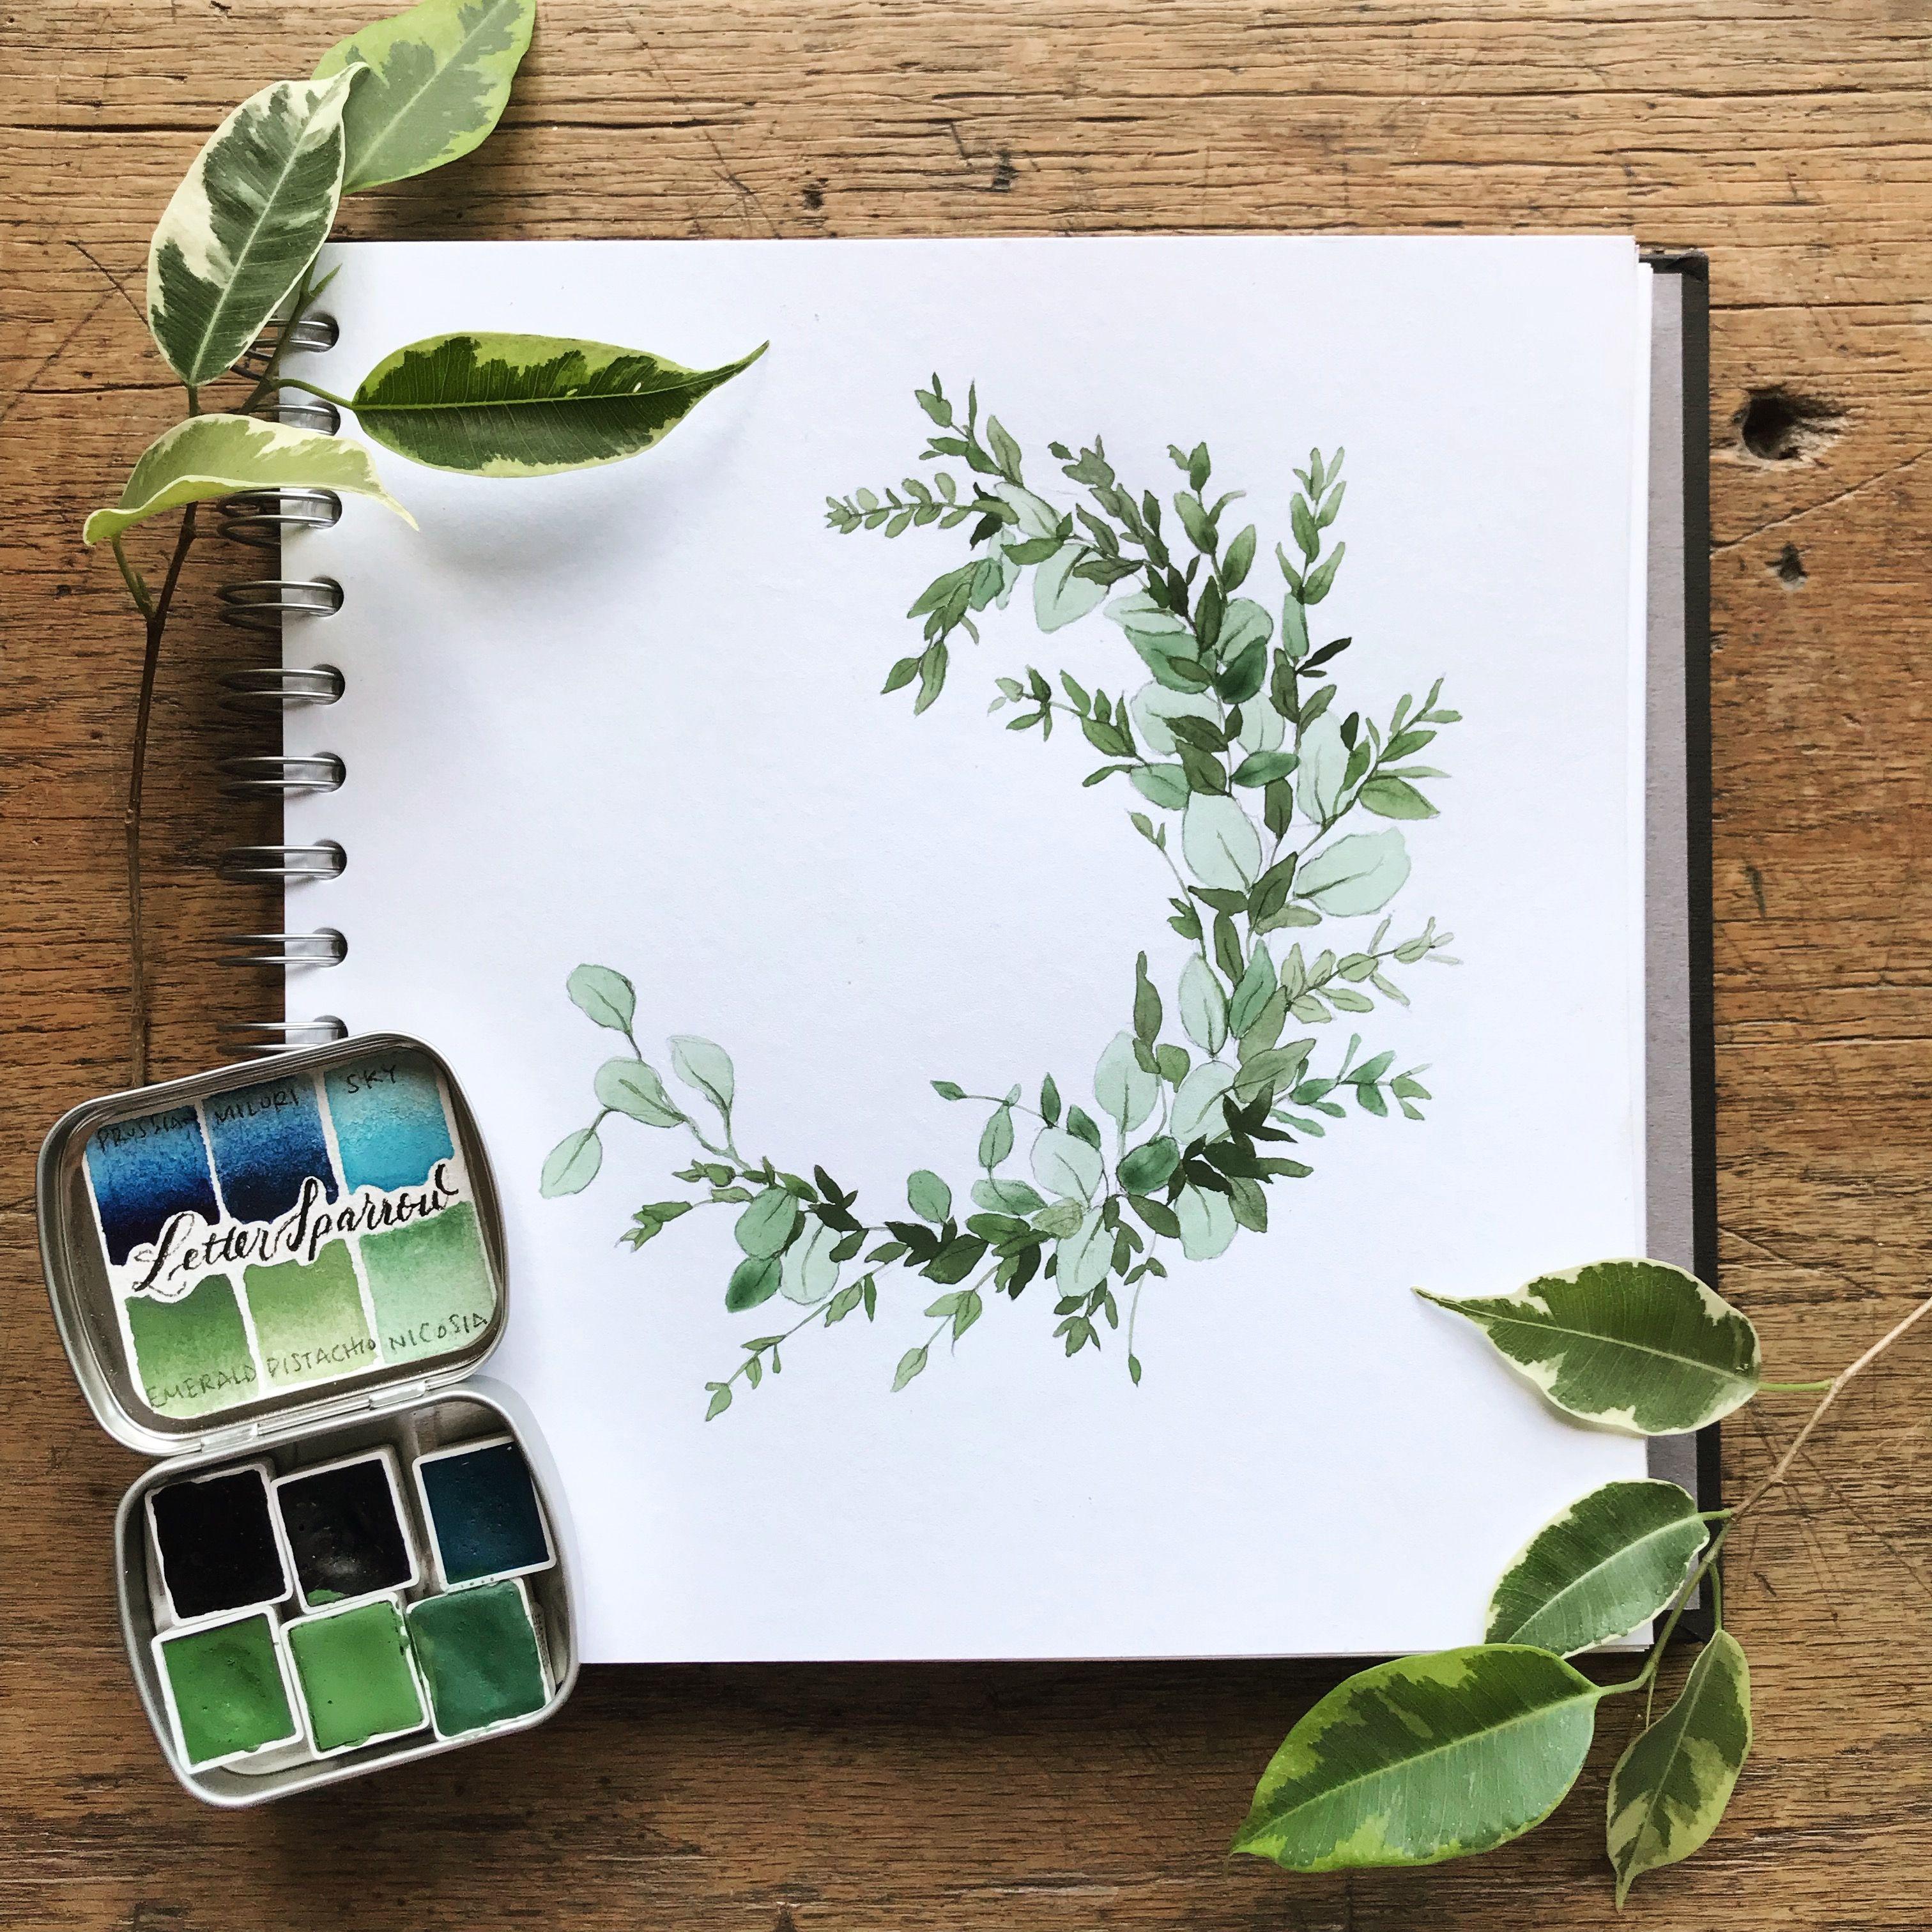 Watercolour Artist, Blogger & Wedding Stationary |